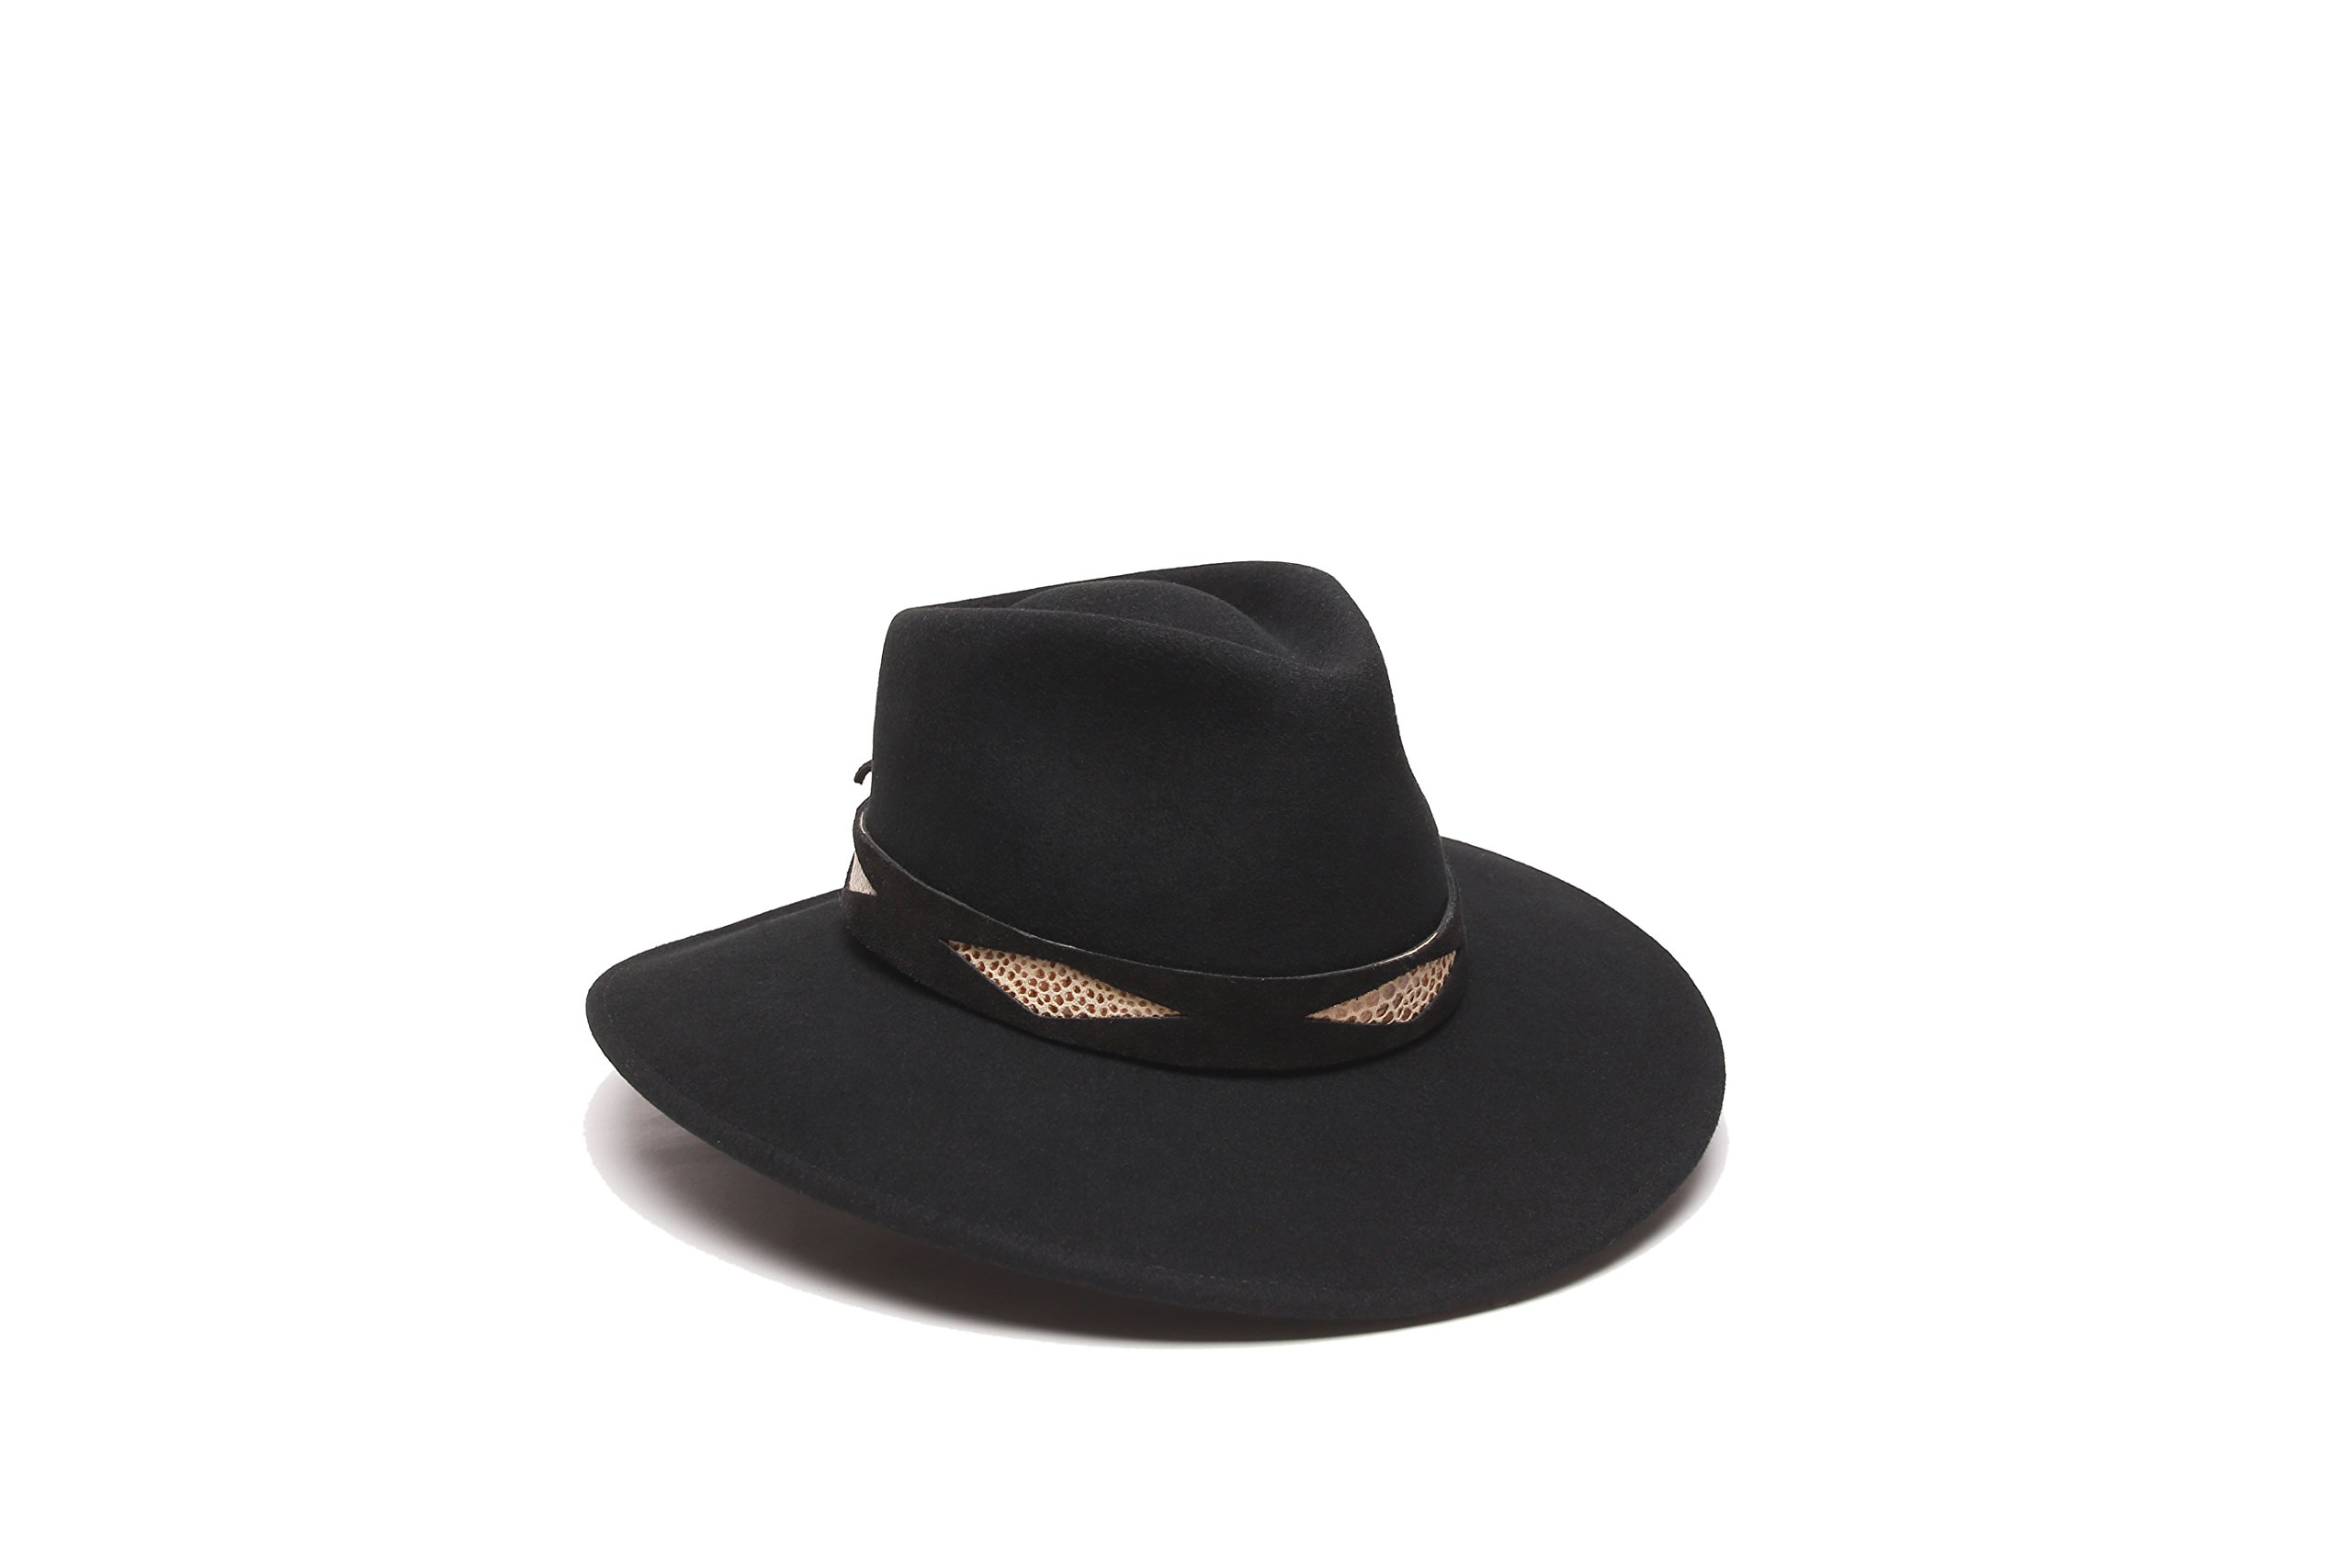 'ale by alessandra Women's Cobra Adjustable Felt Hat With Suede Trim, Black, Adjustable Head Size